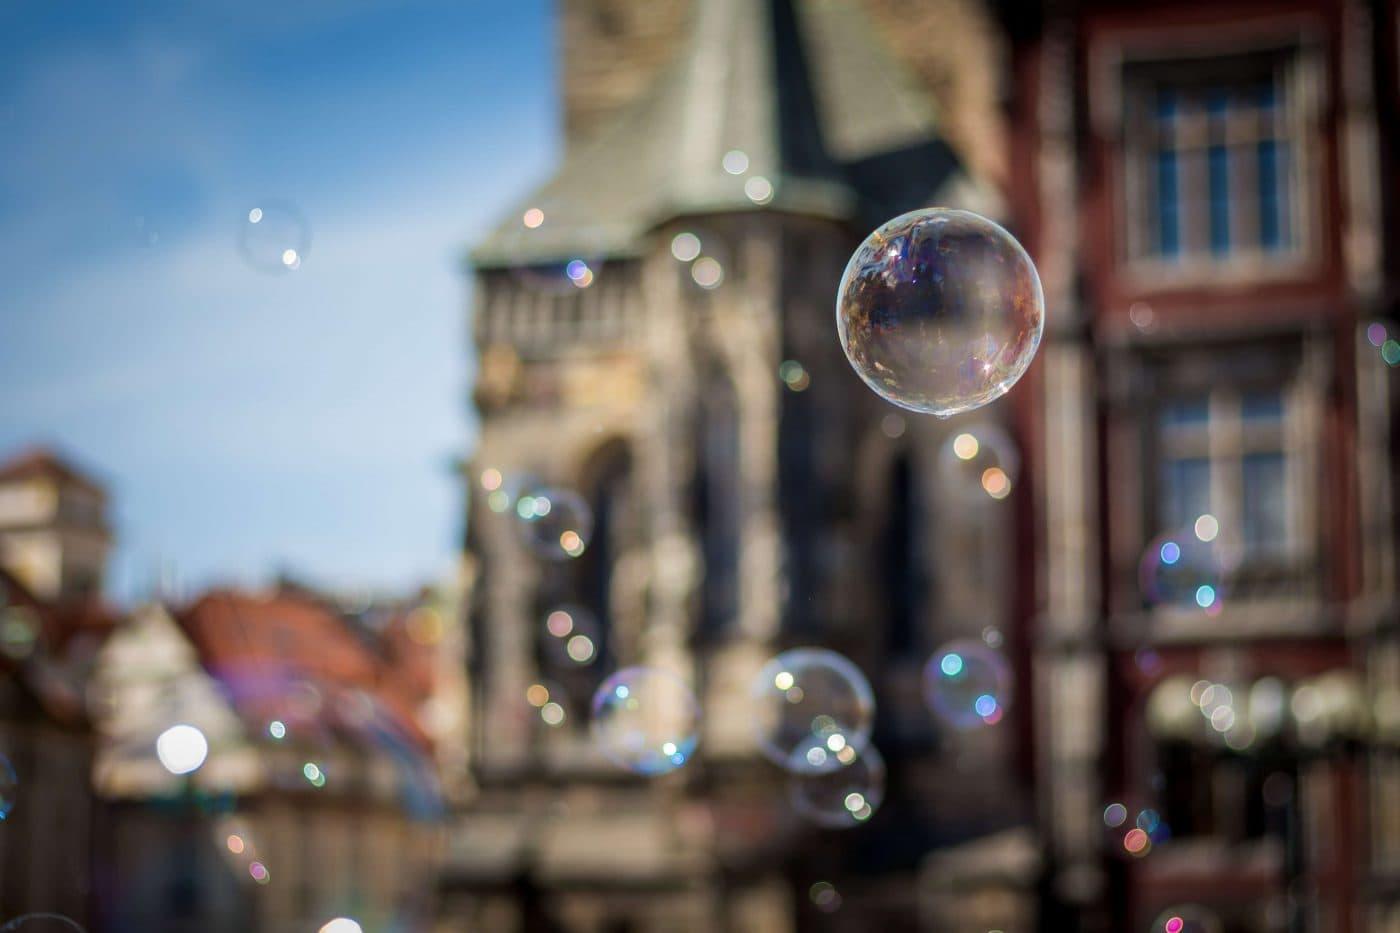 Postcard from the Czech Republic: Bubbles iN Prague